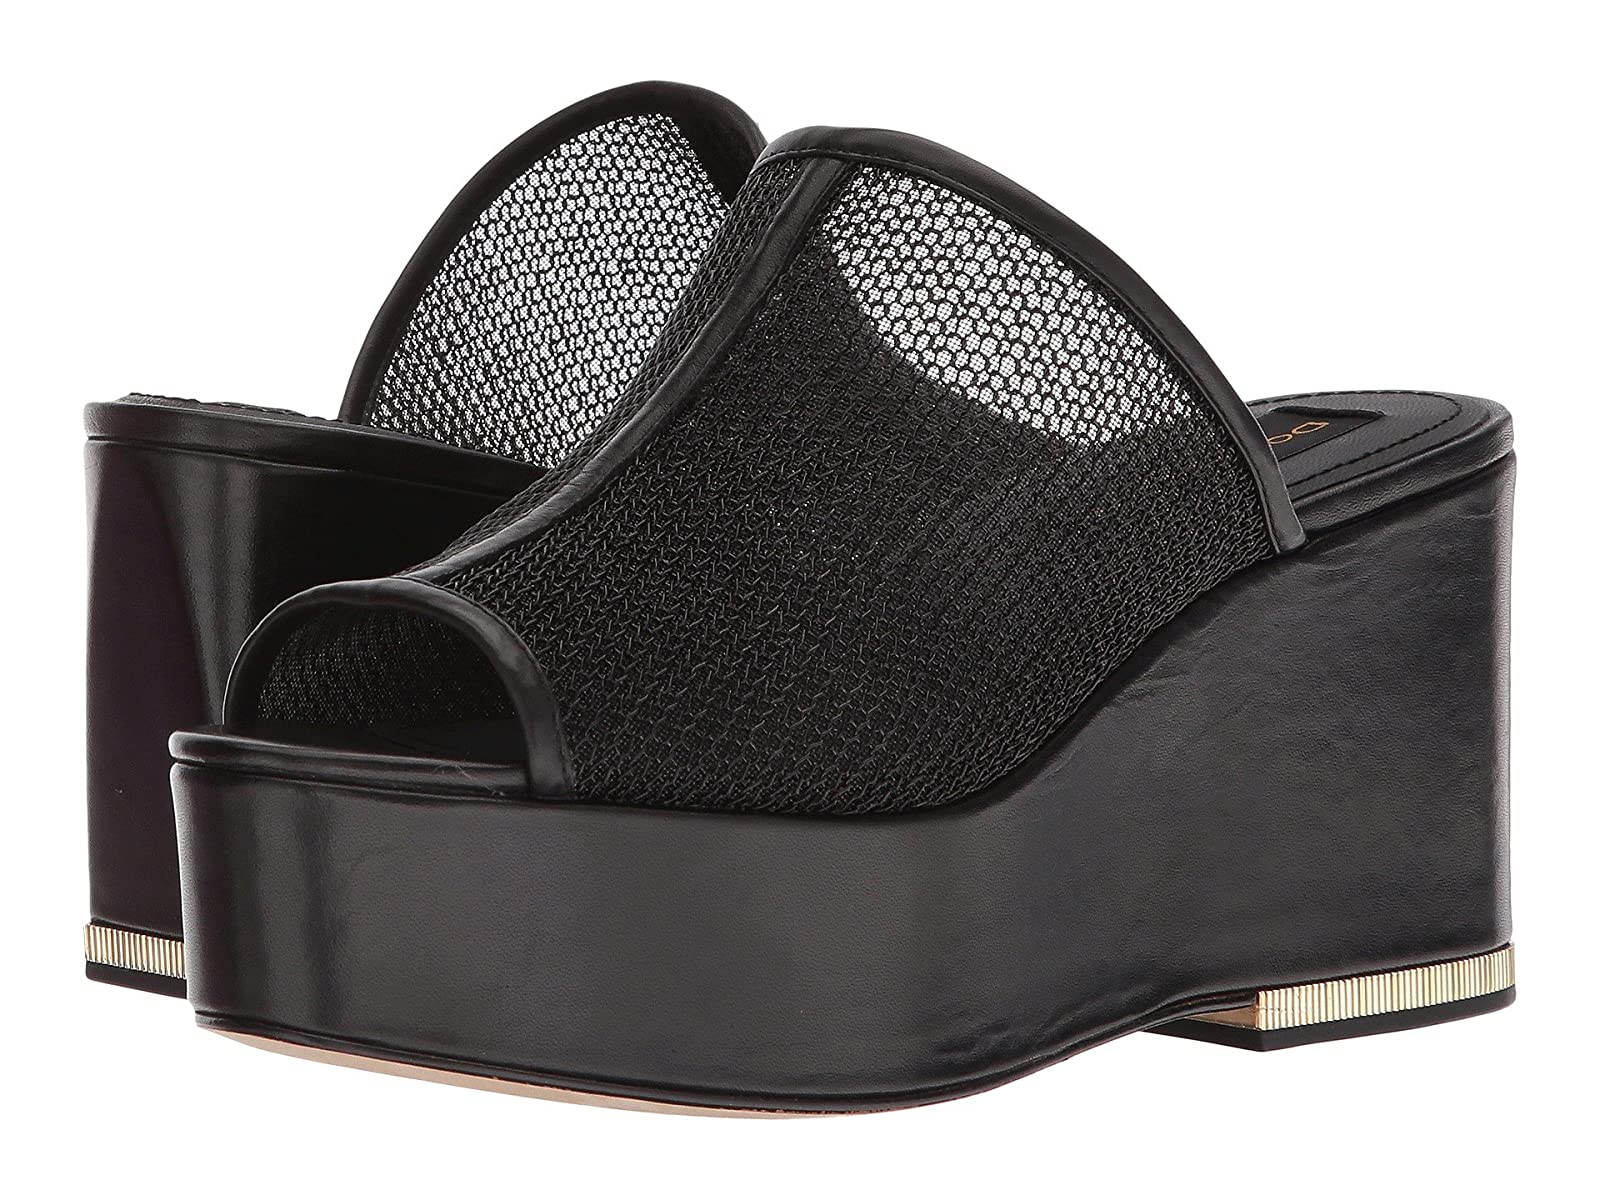 Donna Karan Sade SandalCheap and distinctive eye-catching shoes